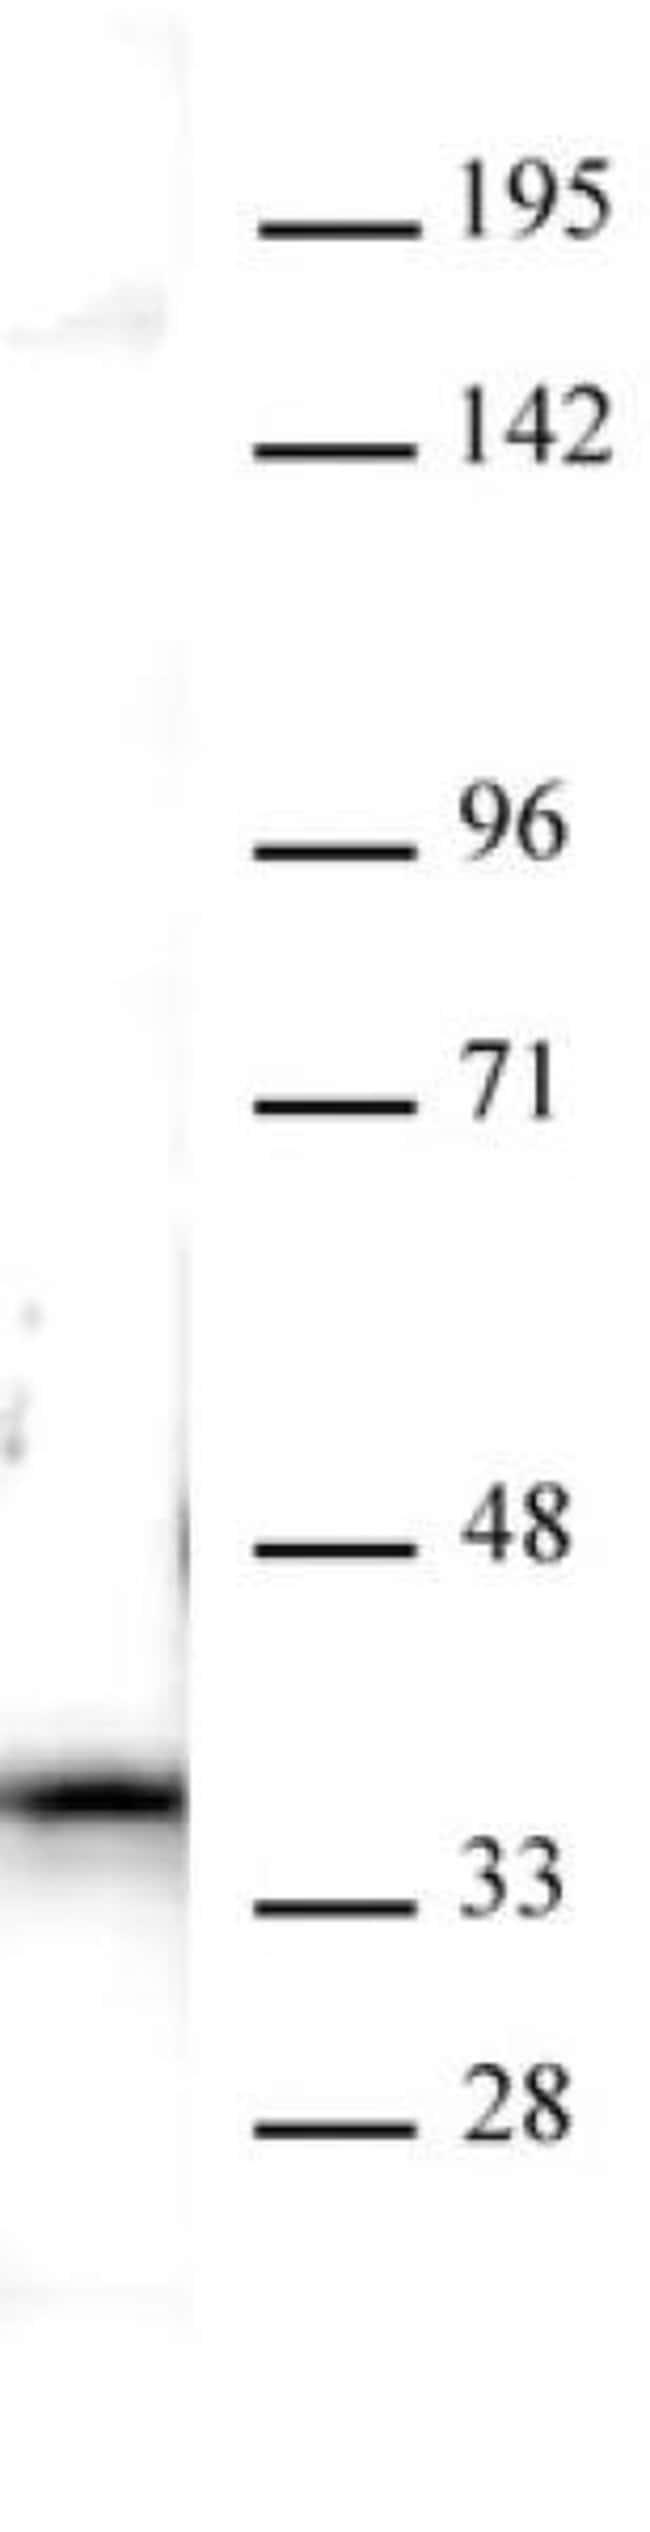 Nucleophosmin Rabbit anti-Human, Unconjugated, Polyclonal, Active Motif:Antibodies:Primary